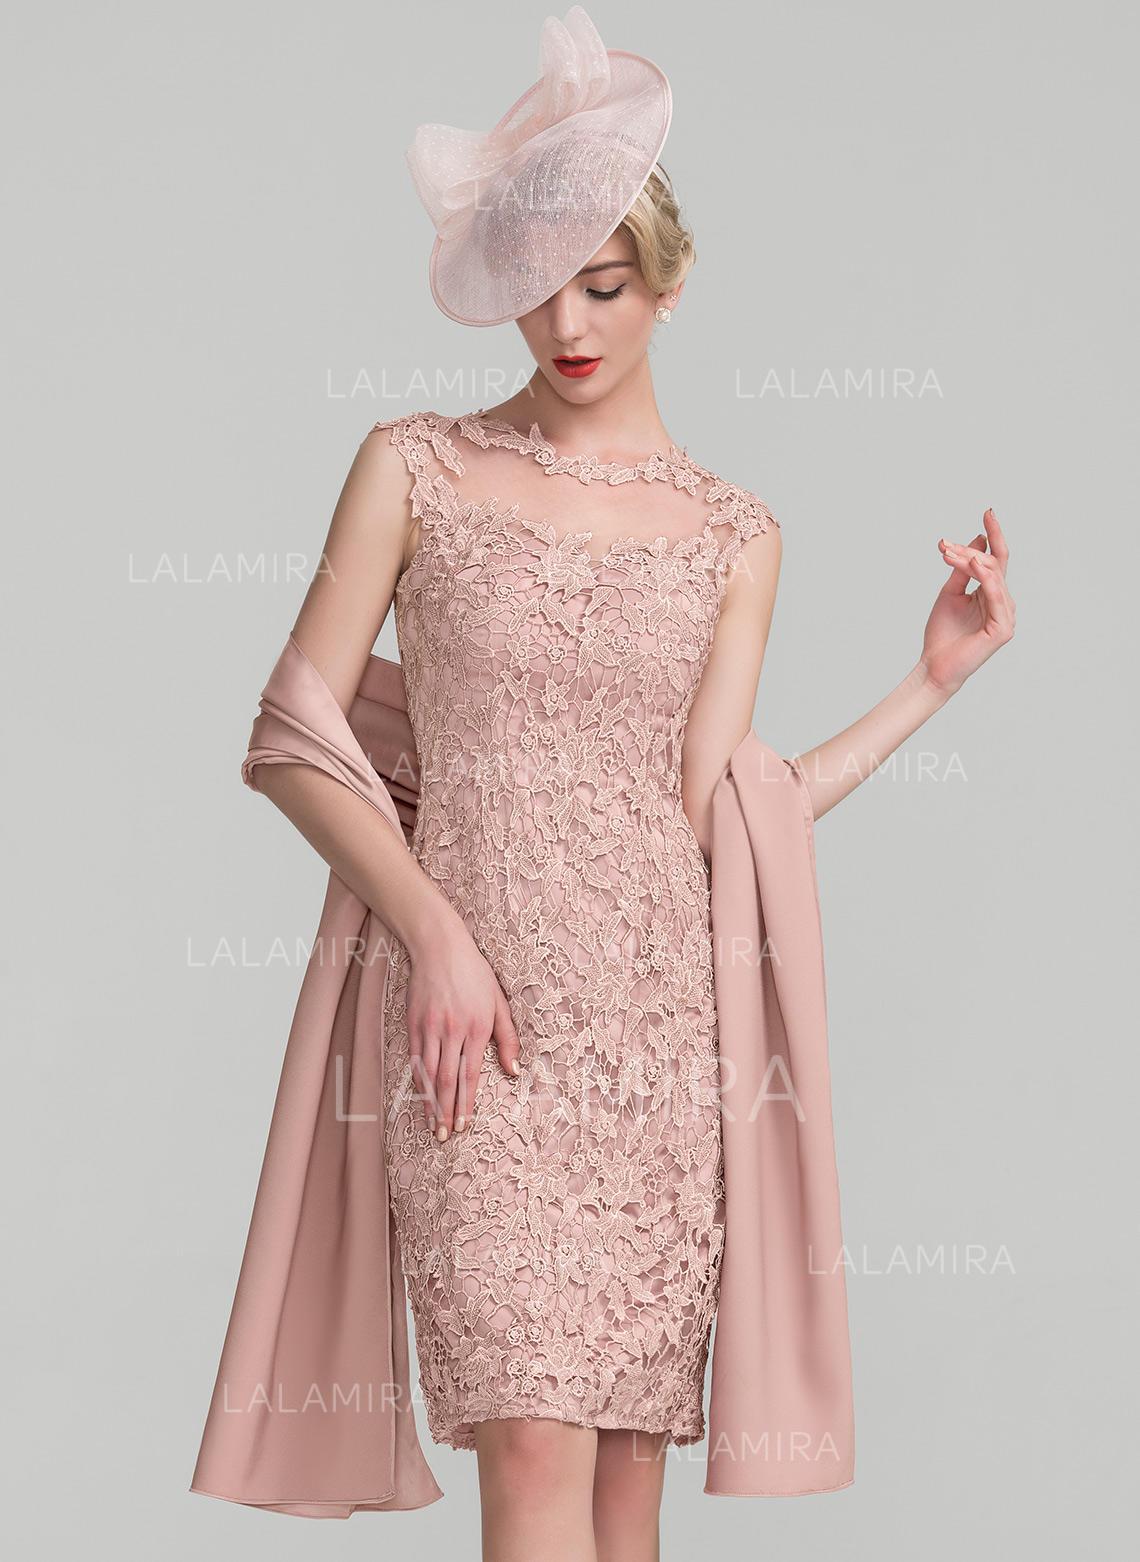 d4146391 Sheath/Column Scoop Neck Knee-Length Lace Cocktail Dress (016174114).  Loading zoom